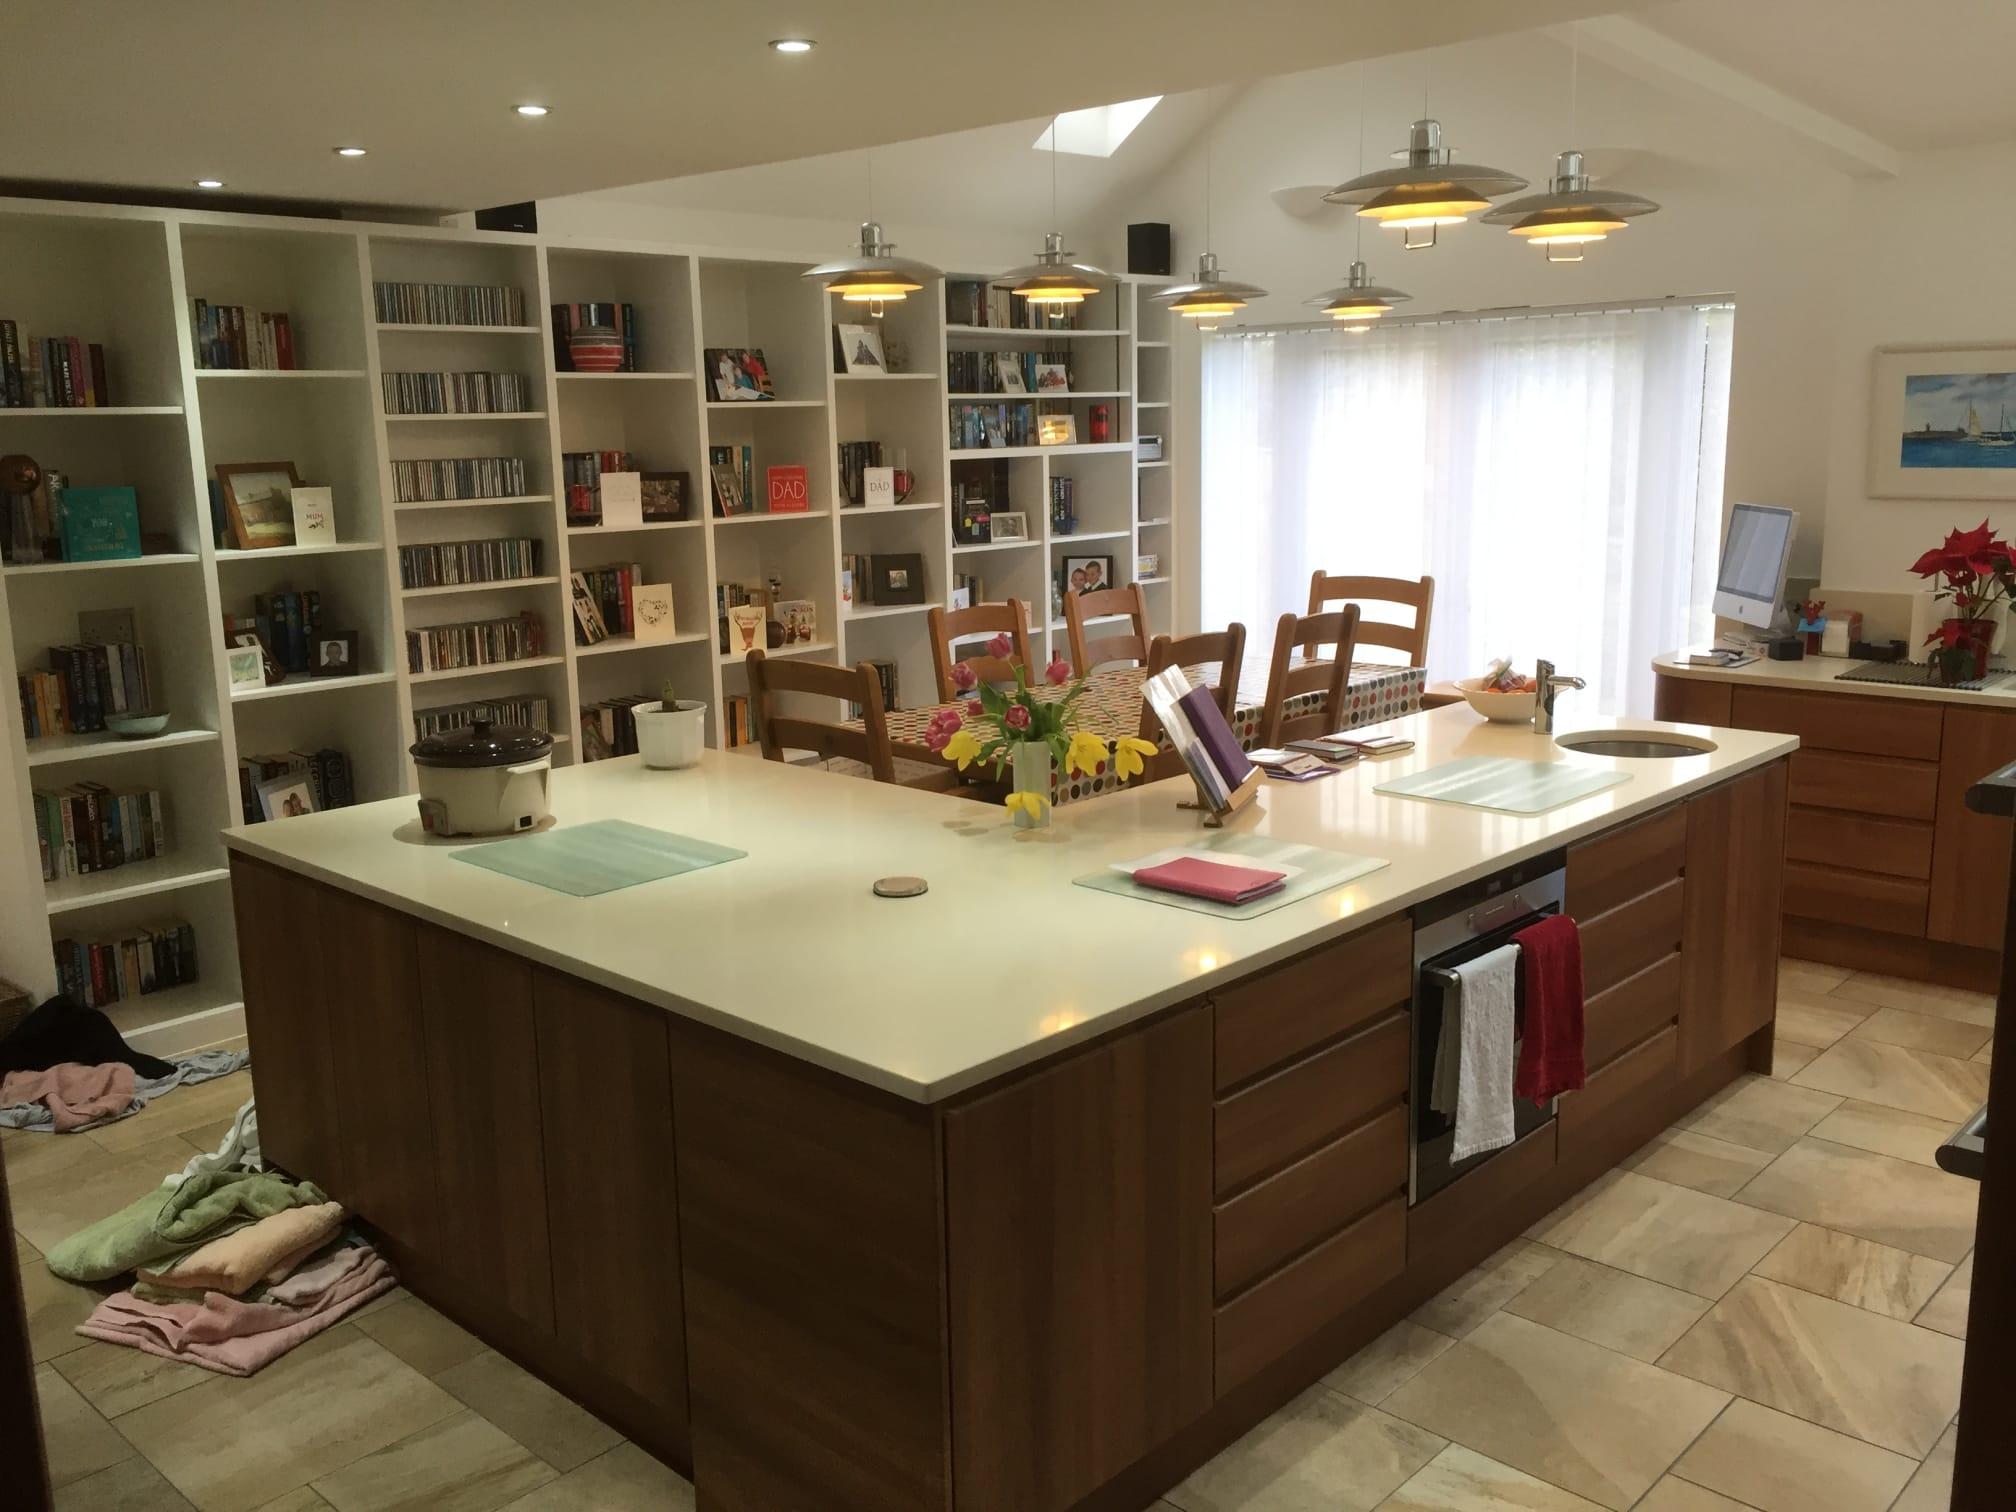 Cruz Kitchens Ltd